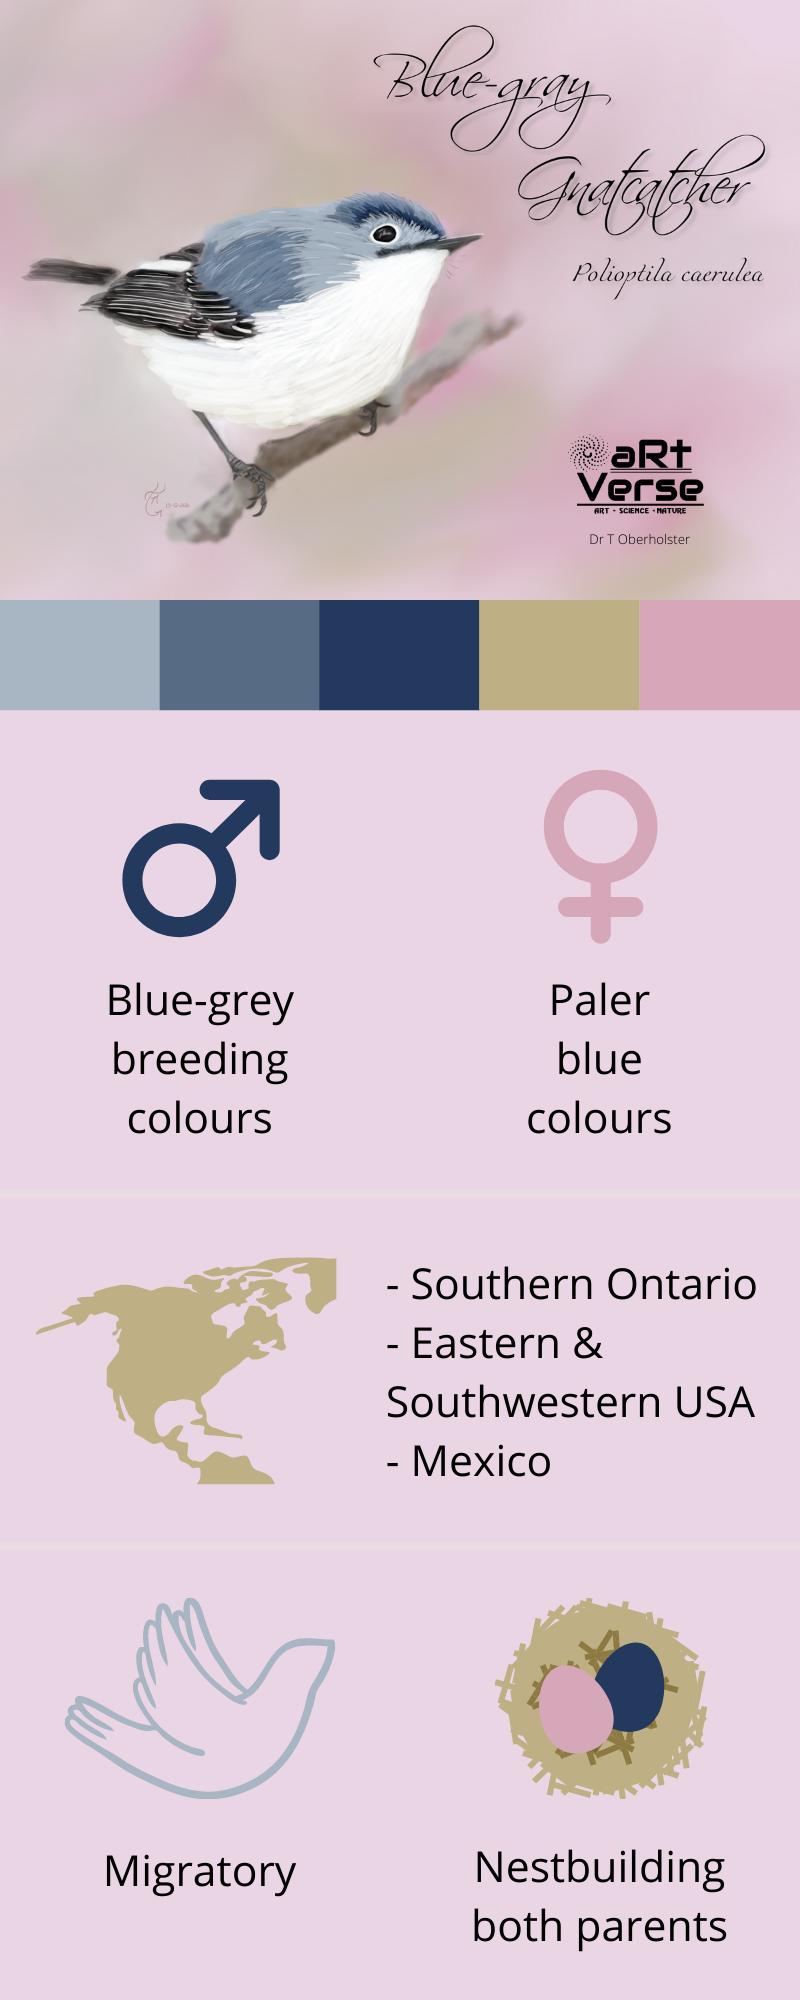 Blue-gray Gnatcatcher, Polioptila caerulea, bird, songbird, ontario, united states, mexico, ink, painted, art, digital, male, female, colours, geographical distribution, migratory, nestbuilding, colour palette